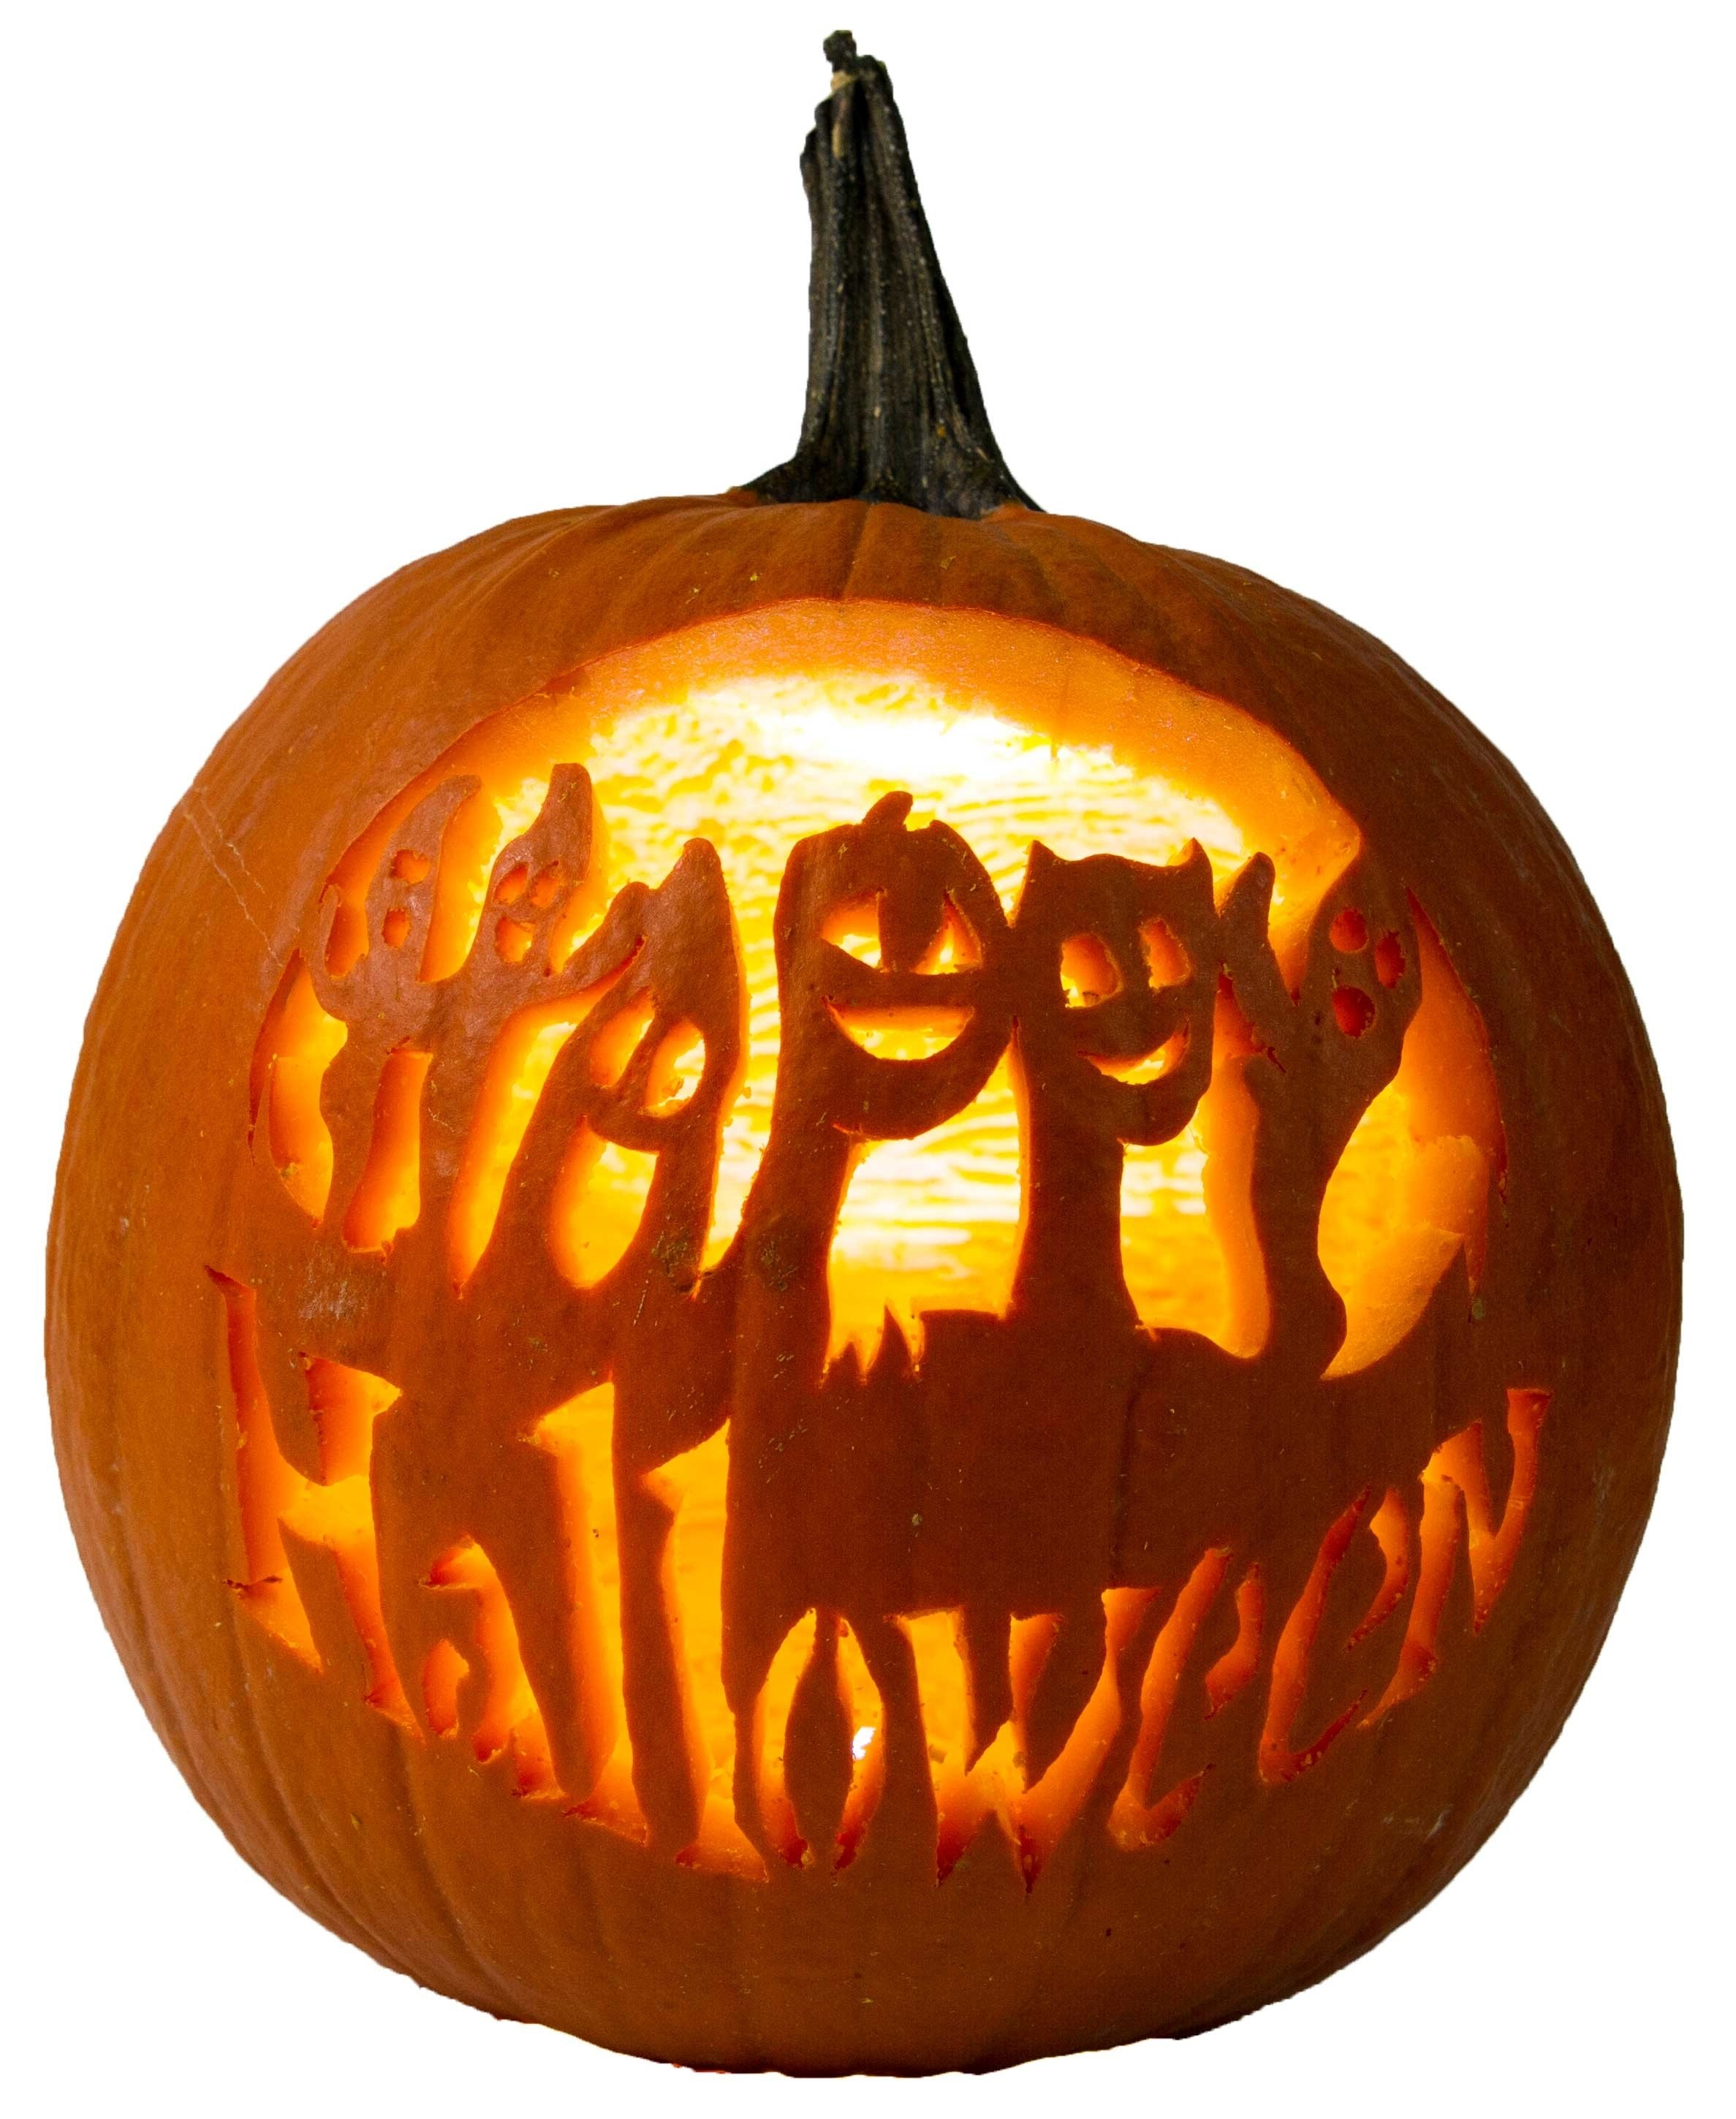 10 Stylish Creative Jack O Lantern Ideas 24 creative jack o lantern ideas to up your pumpkin carving game 4 2020